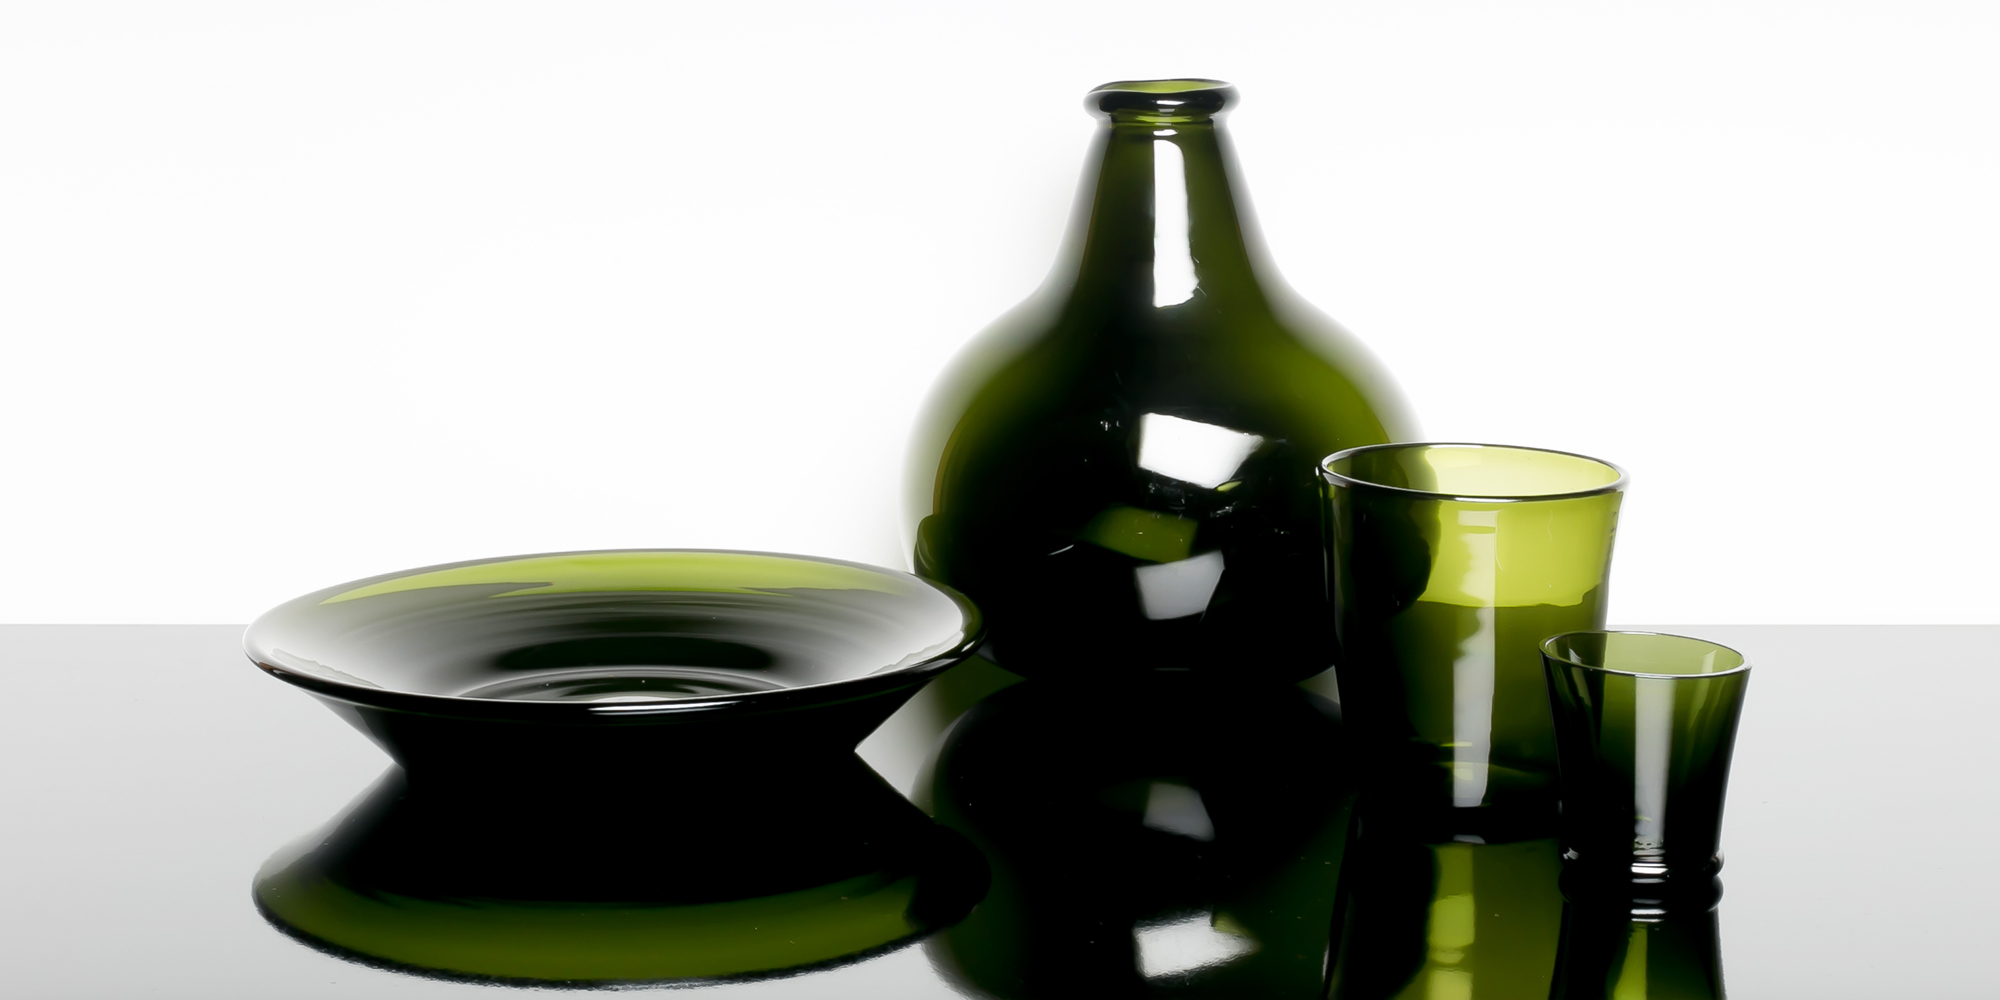 KAJ FRANCK,カイ・フランク,iittala,イッタラ,tupa,waldglas,forest glass,森林ガラス,ガラス工芸,北欧